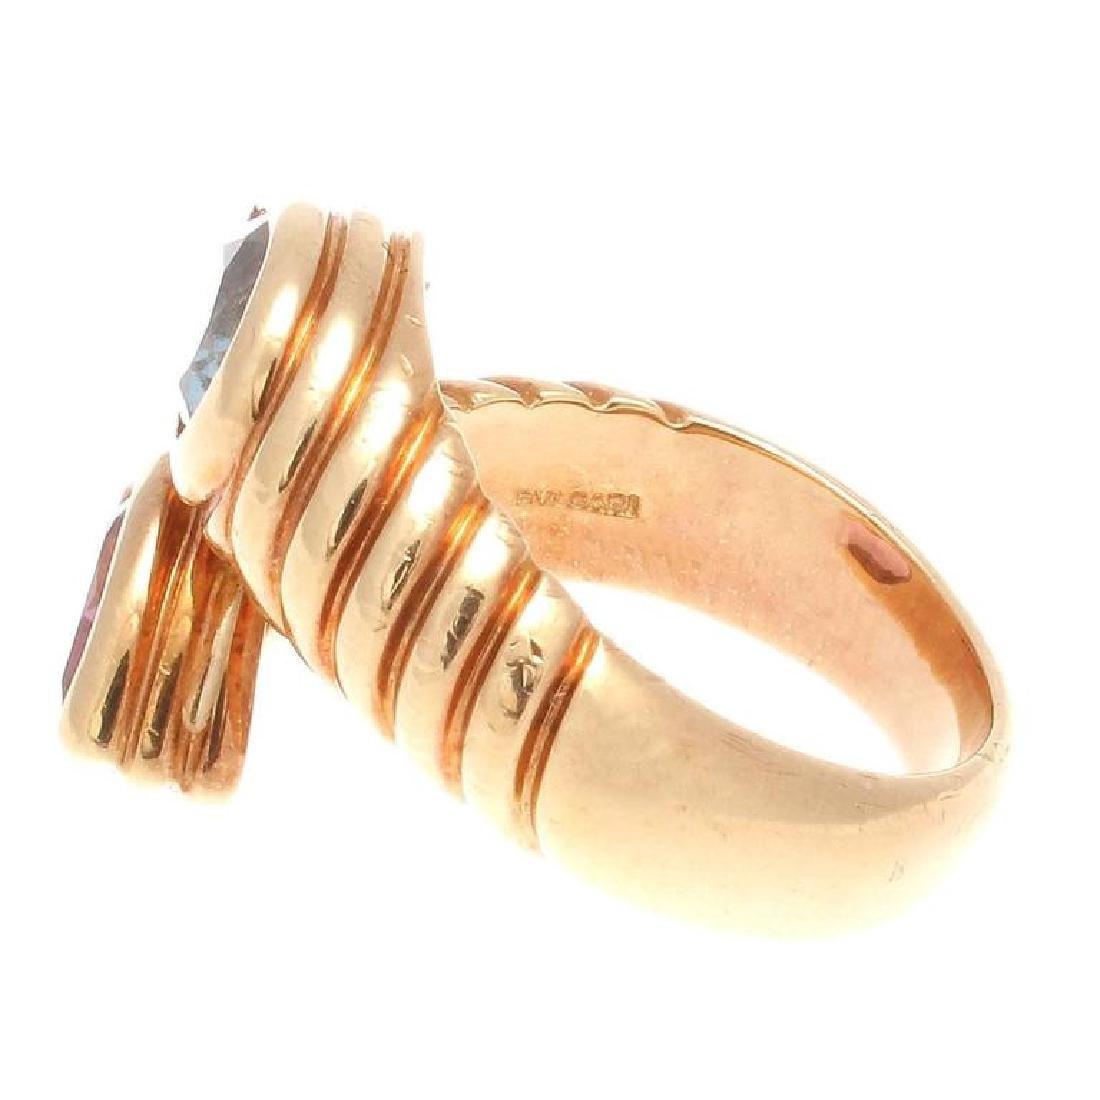 Bulgari 18K Gold TopazTourmaline Snake Ring - 3